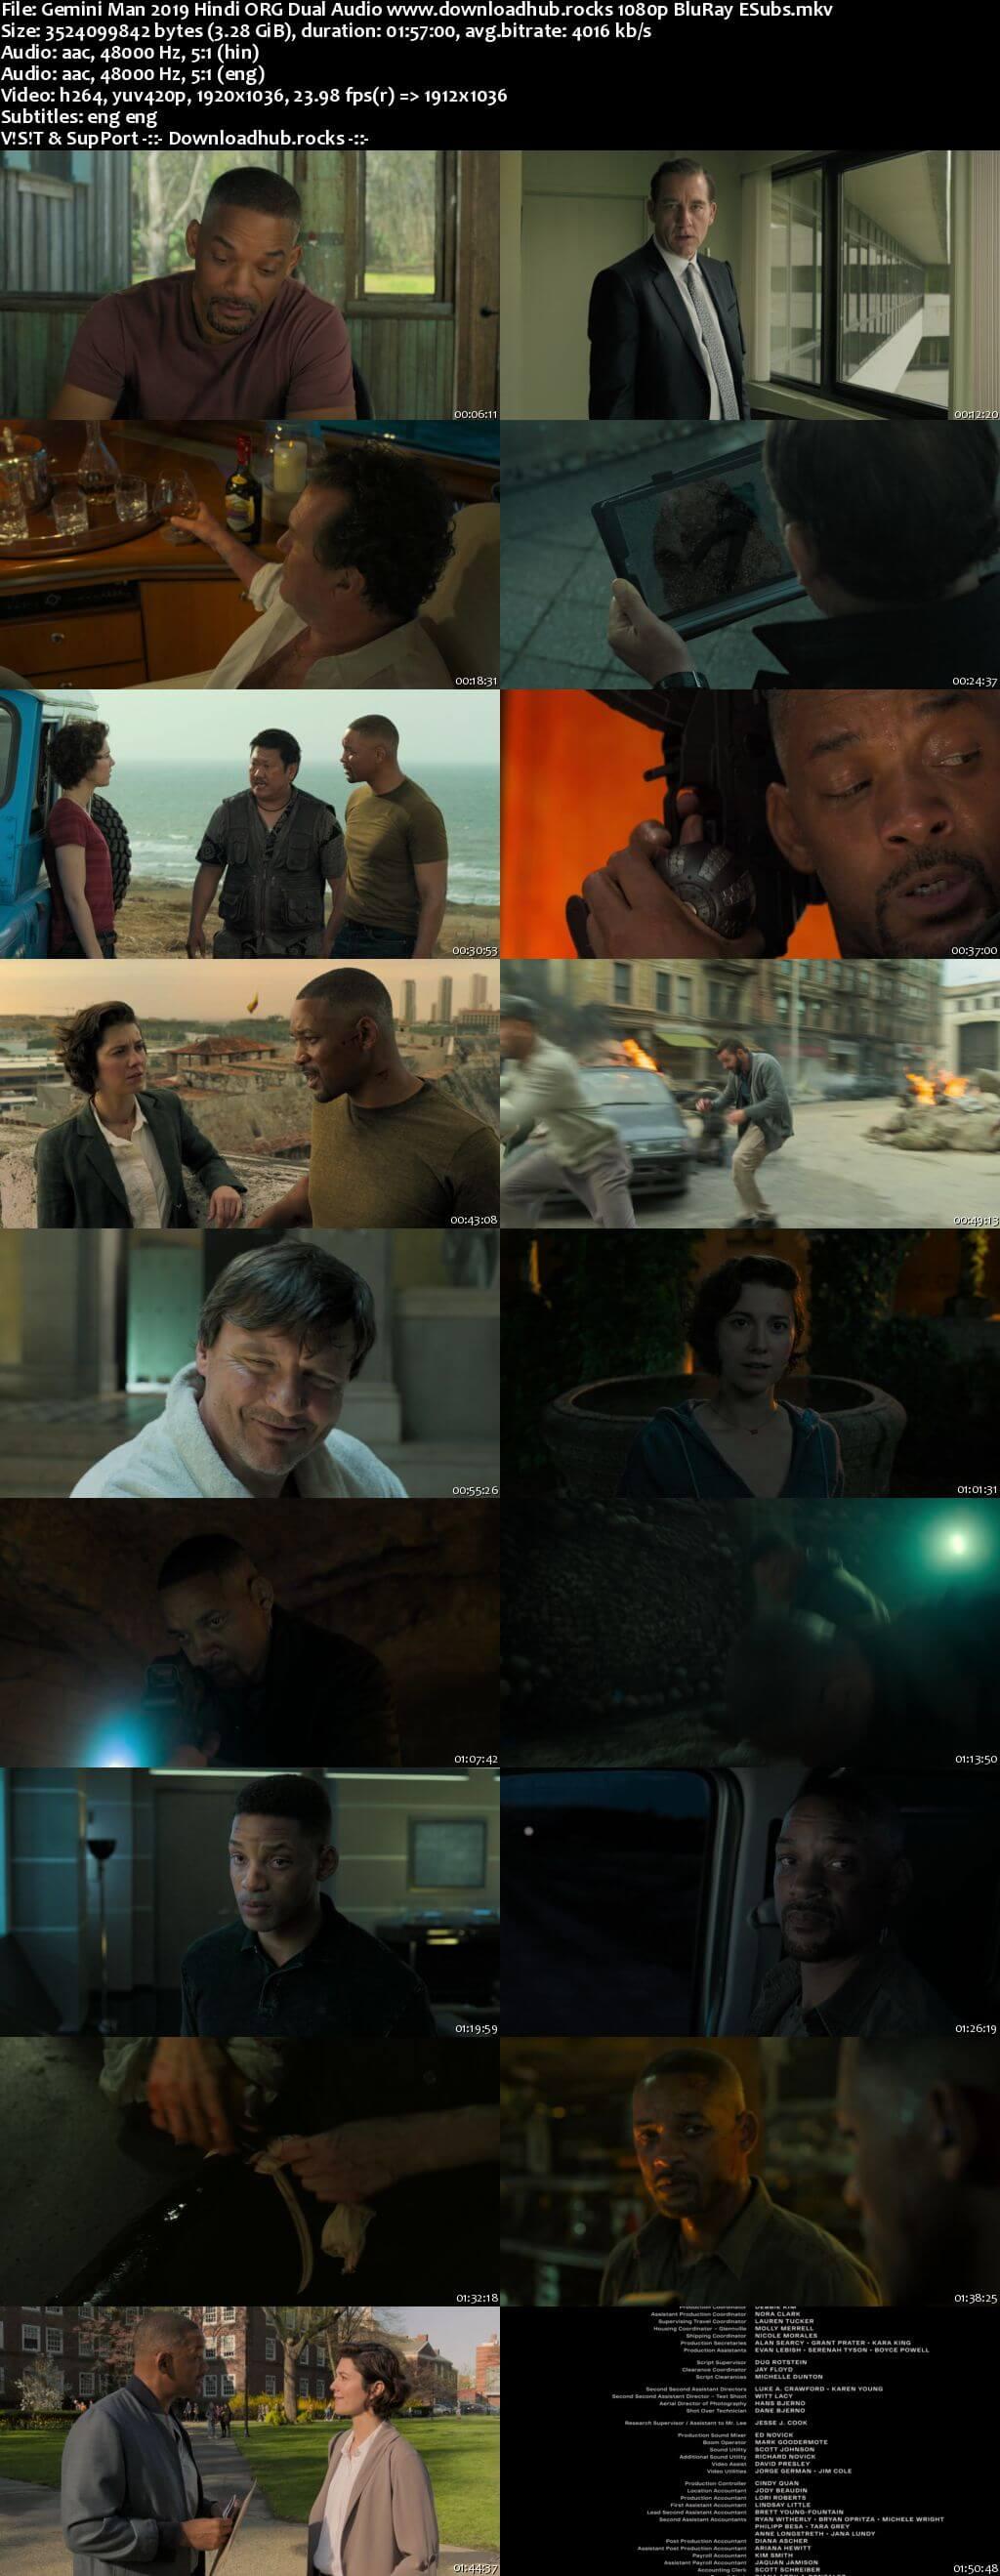 Gemini Man 2019 Hindi ORG Dual Audio 1080p BluRay ESubs